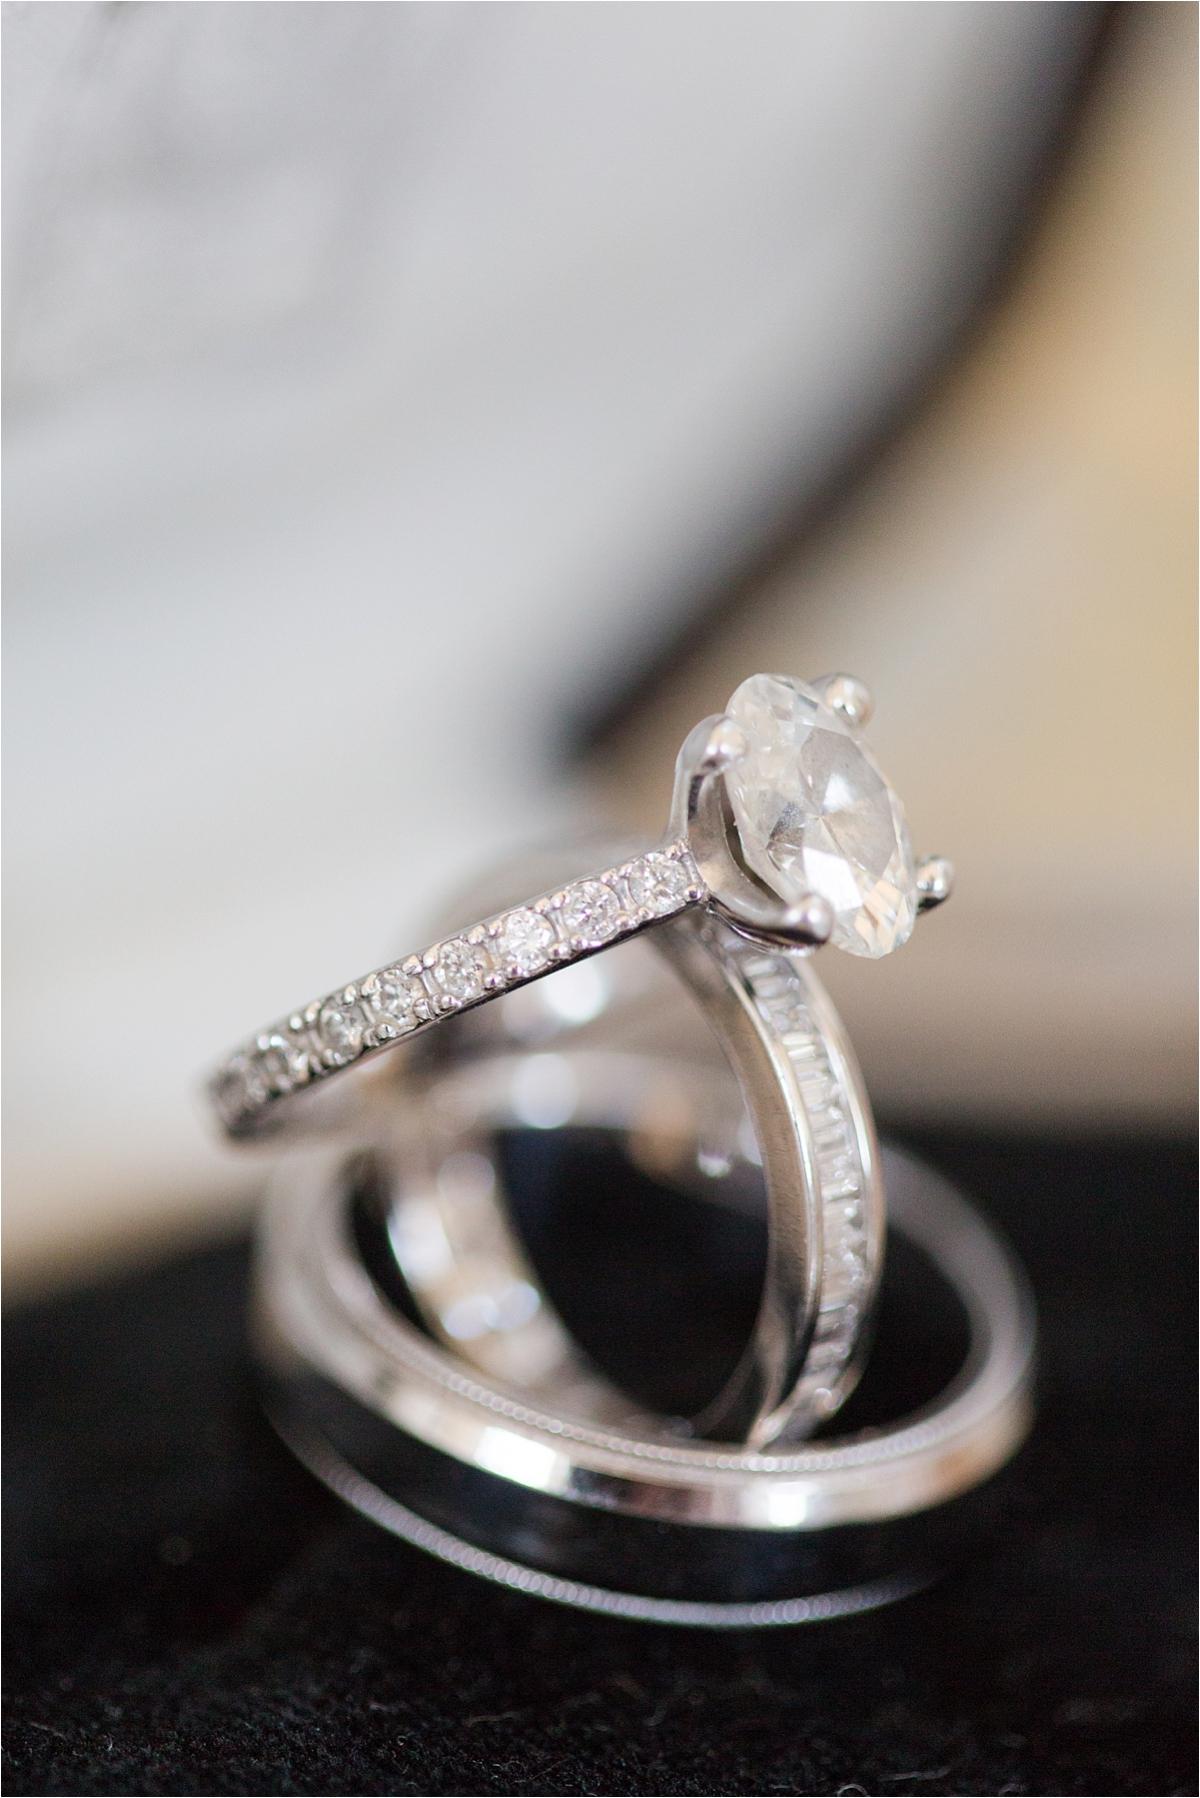 Seaside Florida Wedding Photographer-Catherine Carter + Brian-Wedding ring-Wedding details-Alabama photographer